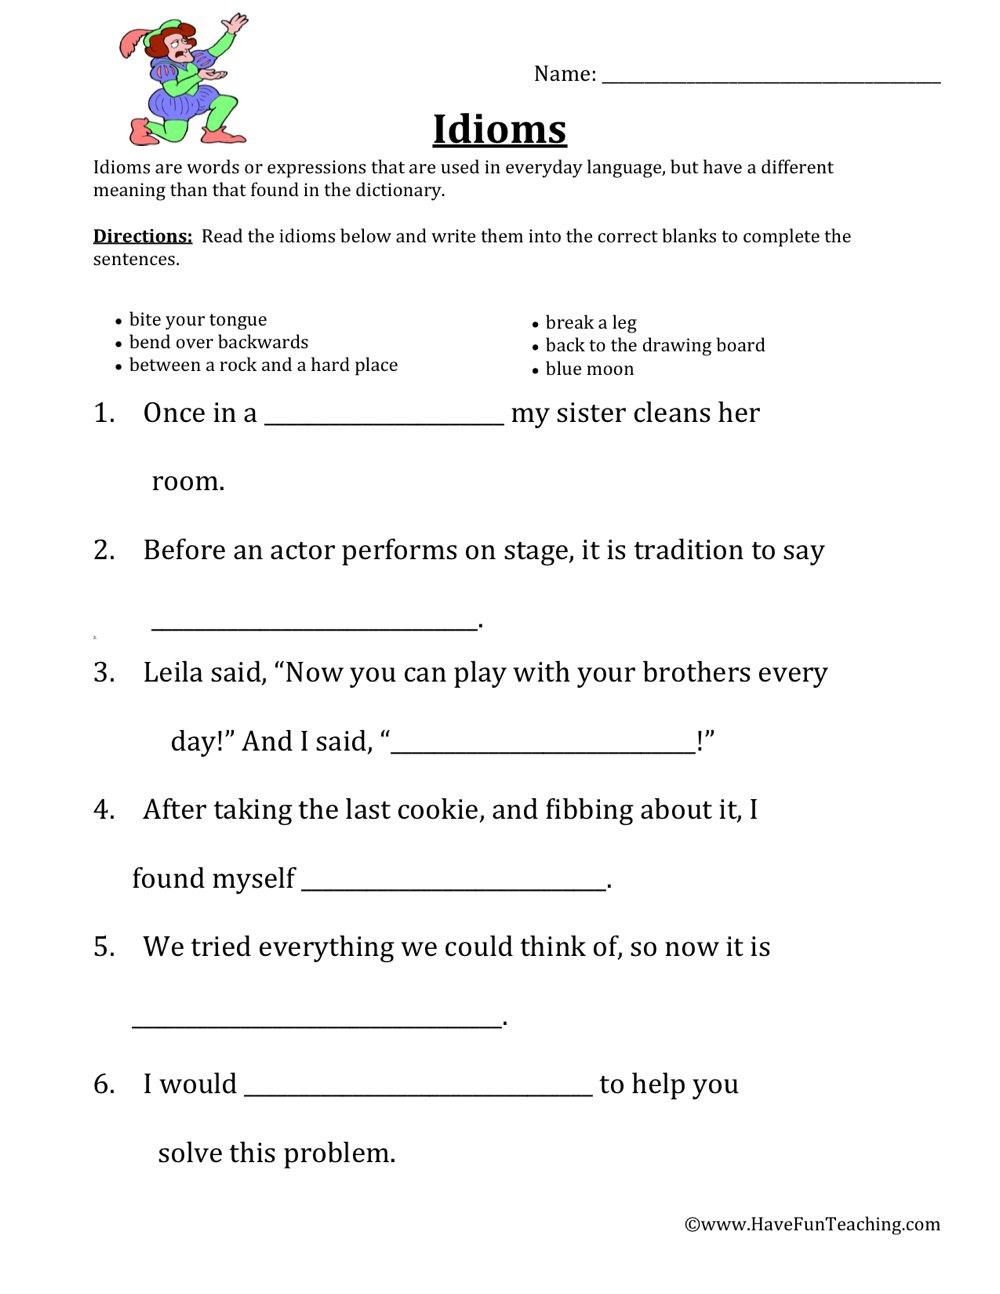 Idioms Worksheets  Have Fun Teaching